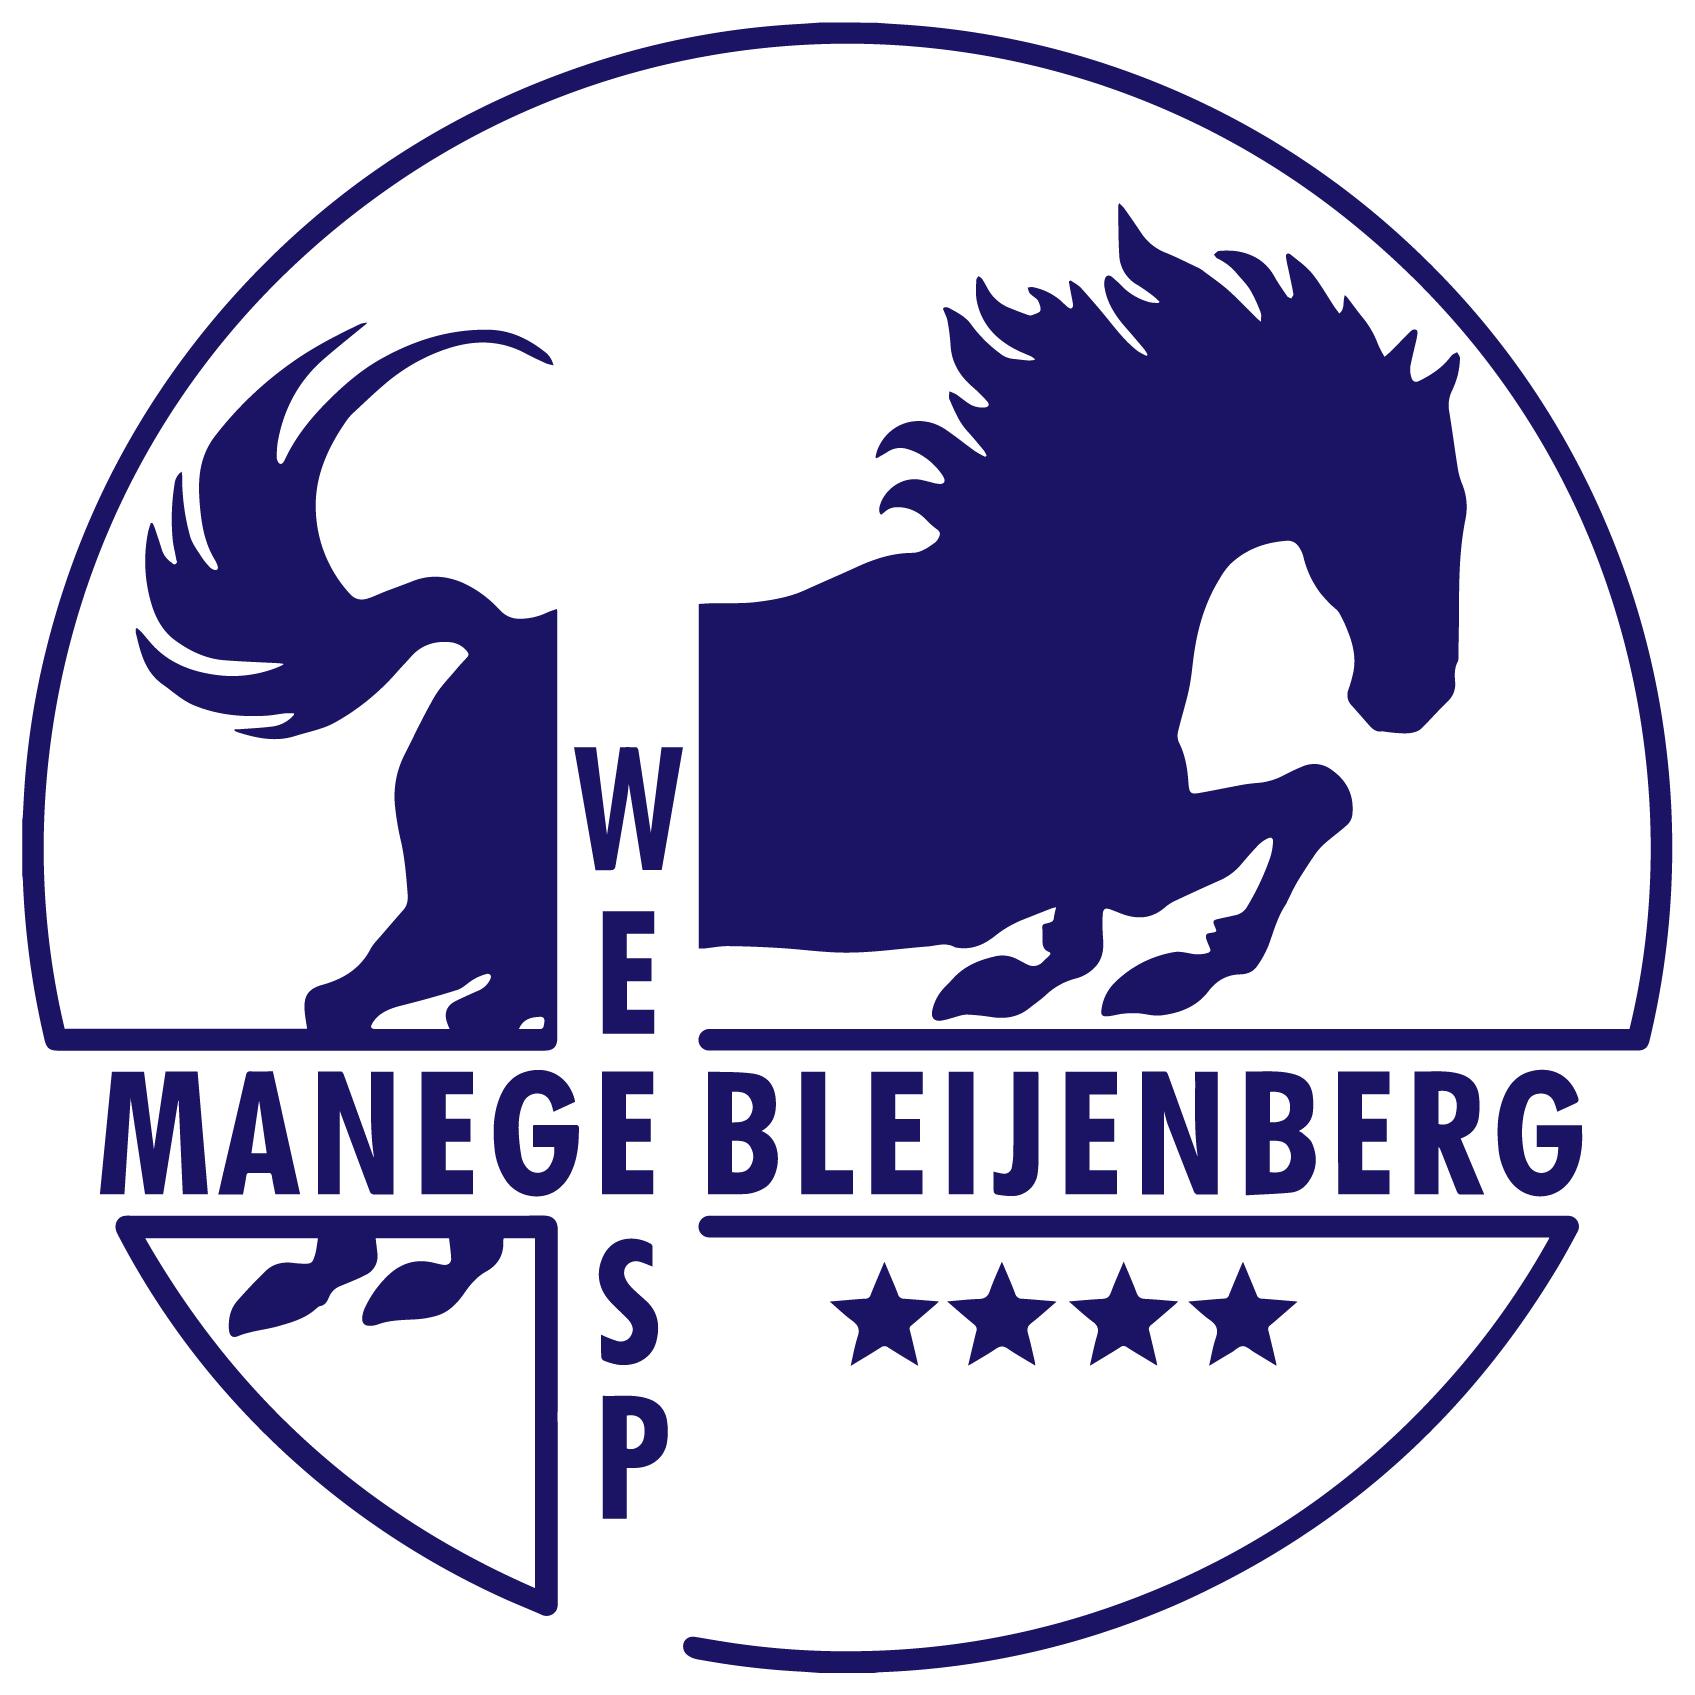 Manege Bleijenberg